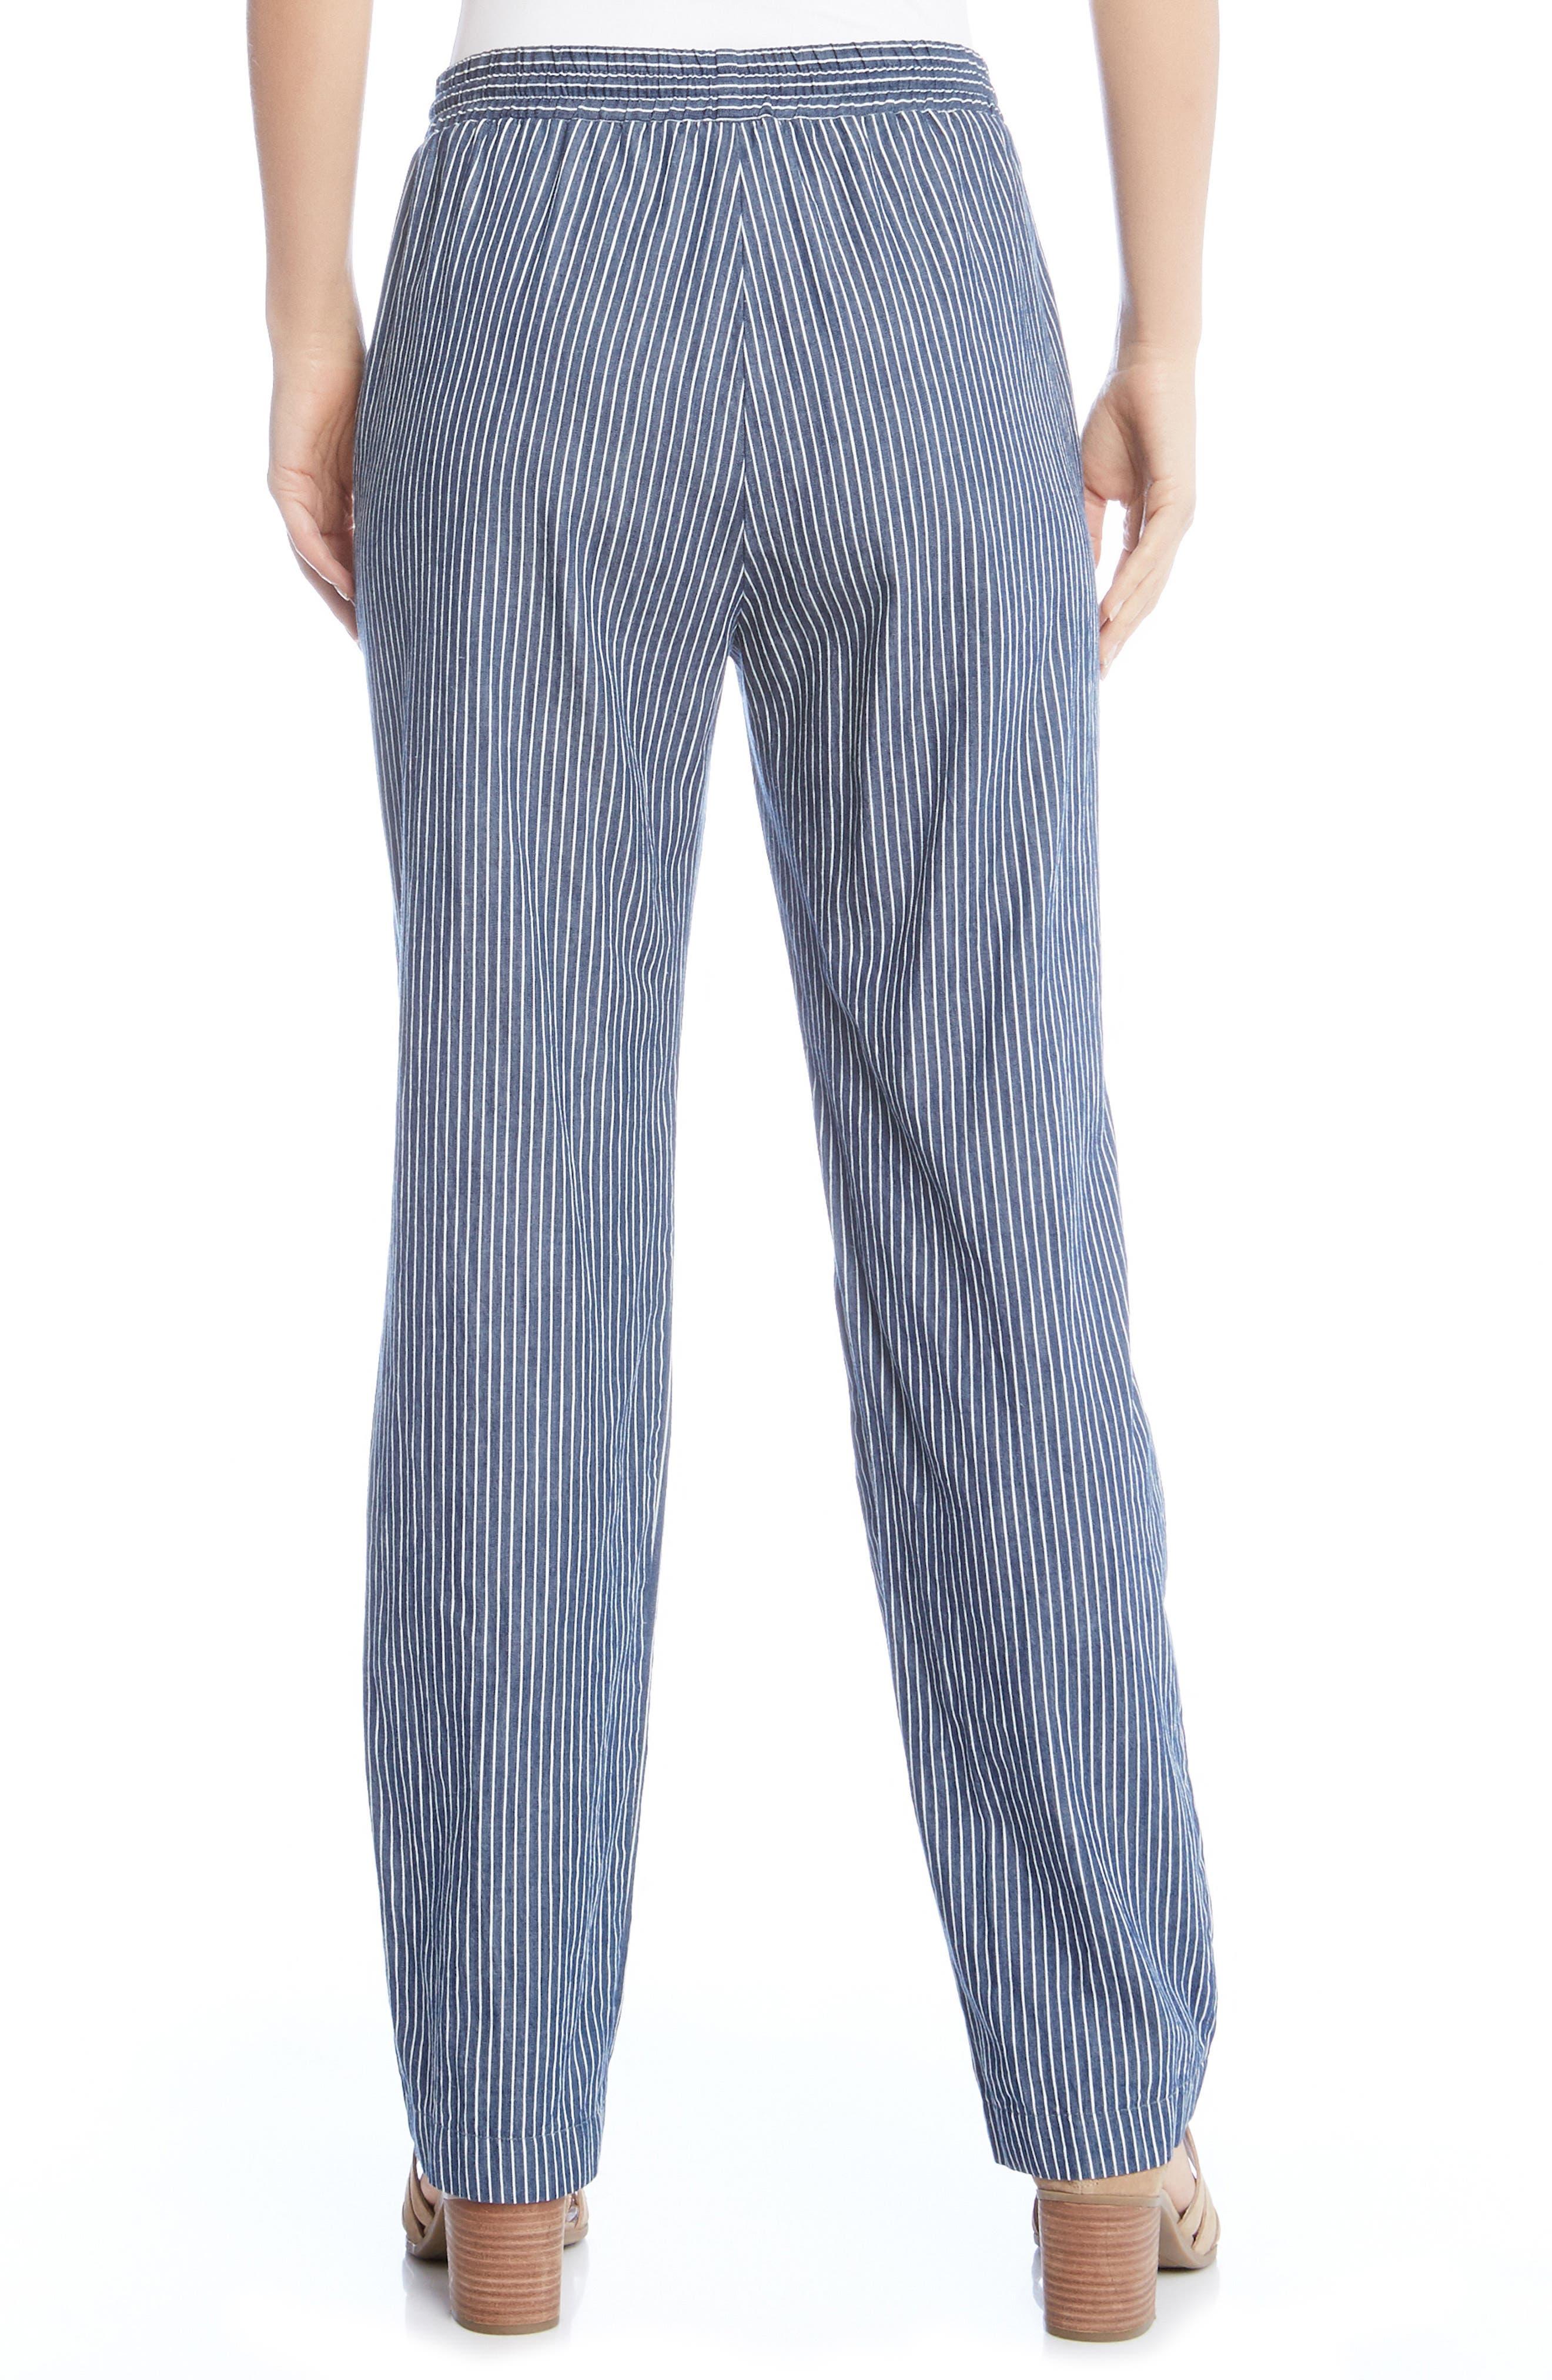 Stripe Drawsting Pants,                             Alternate thumbnail 3, color,                             Striped